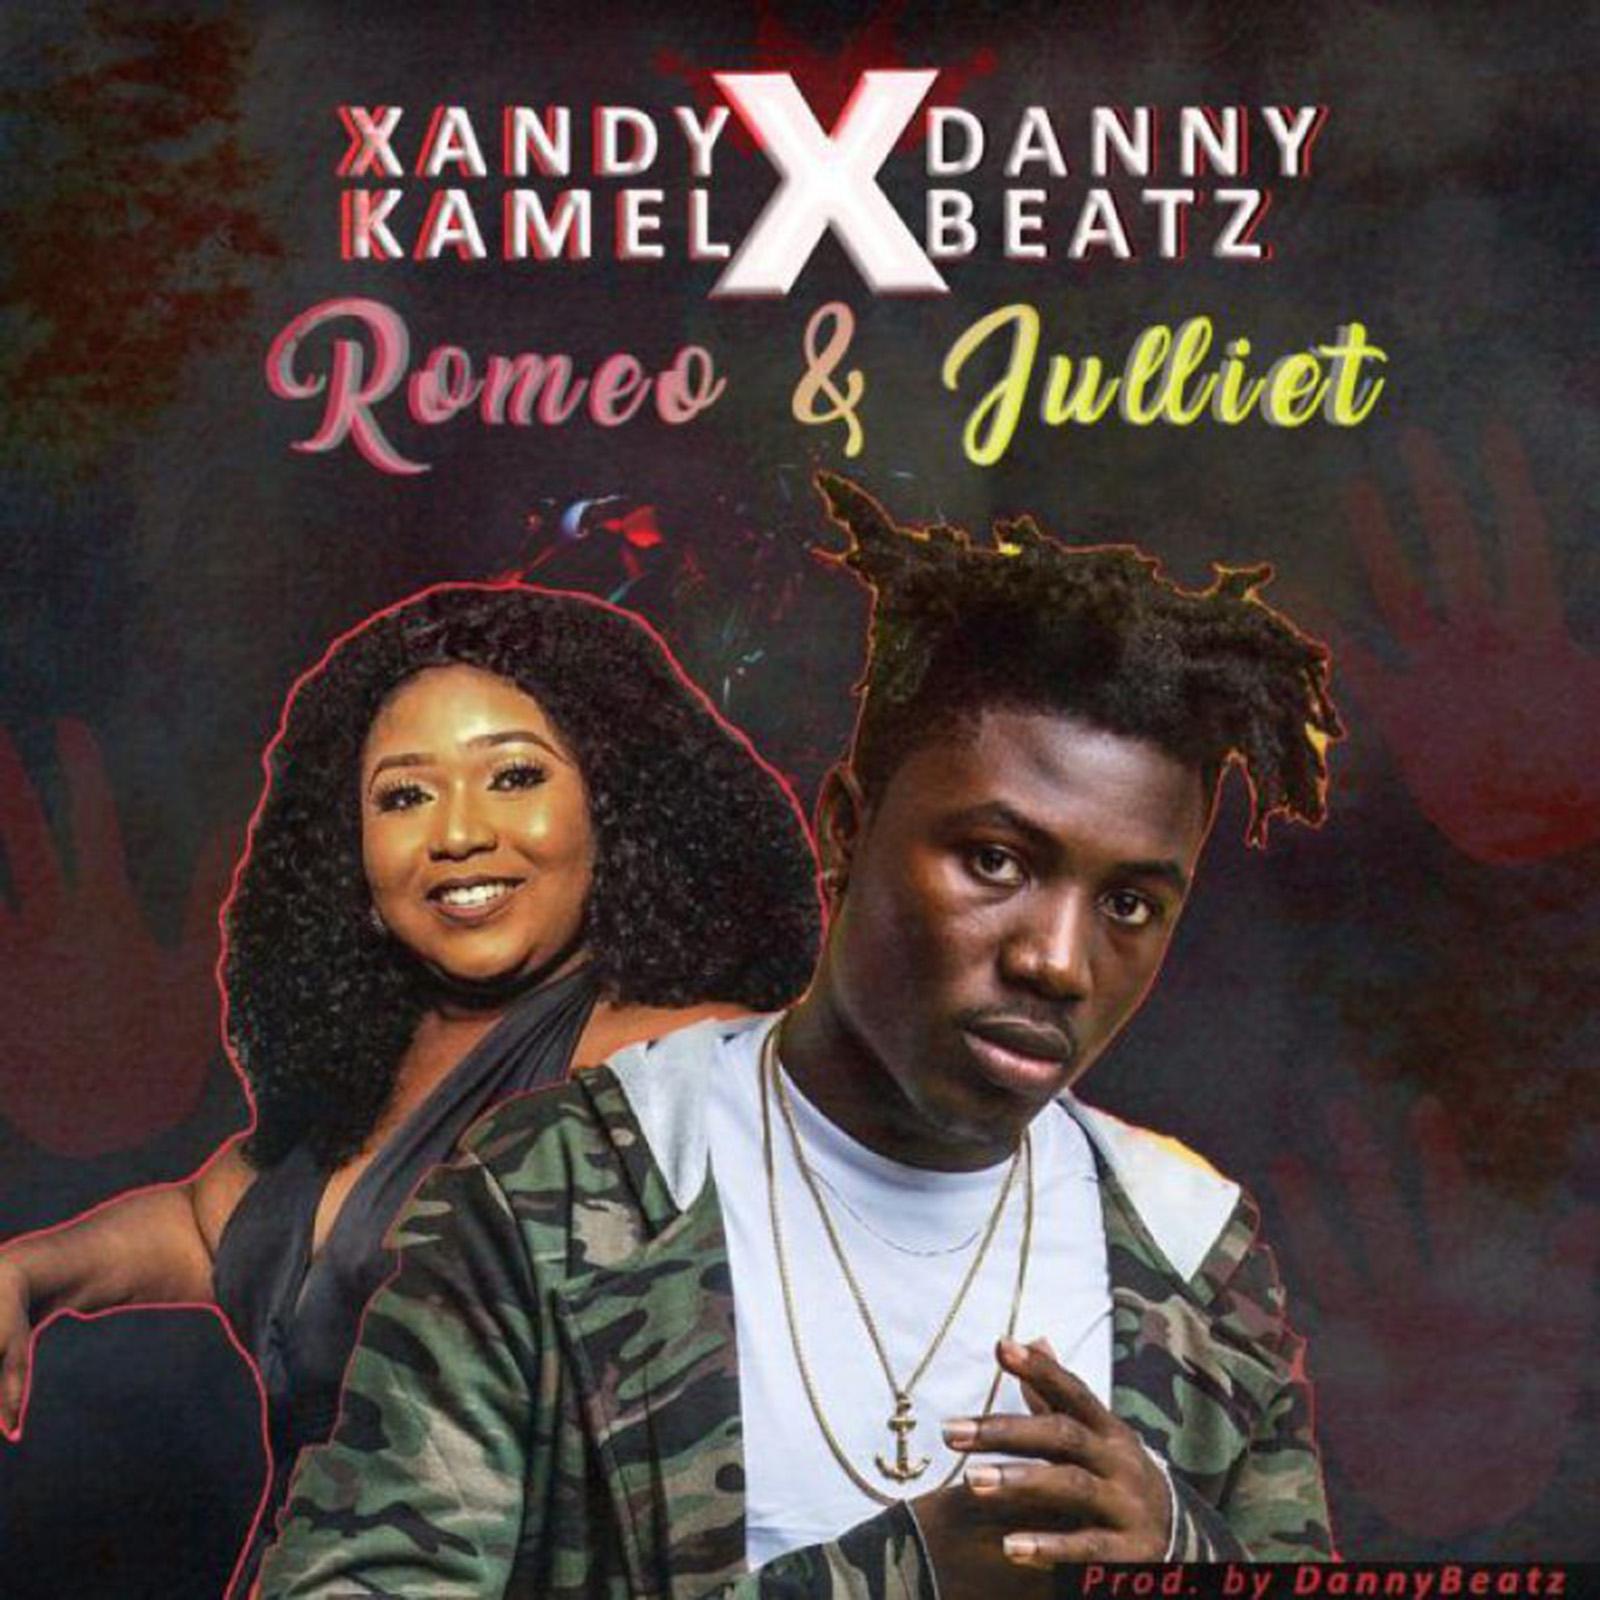 Romeo & Julliet by Xandy Kamel & Danny Beatz